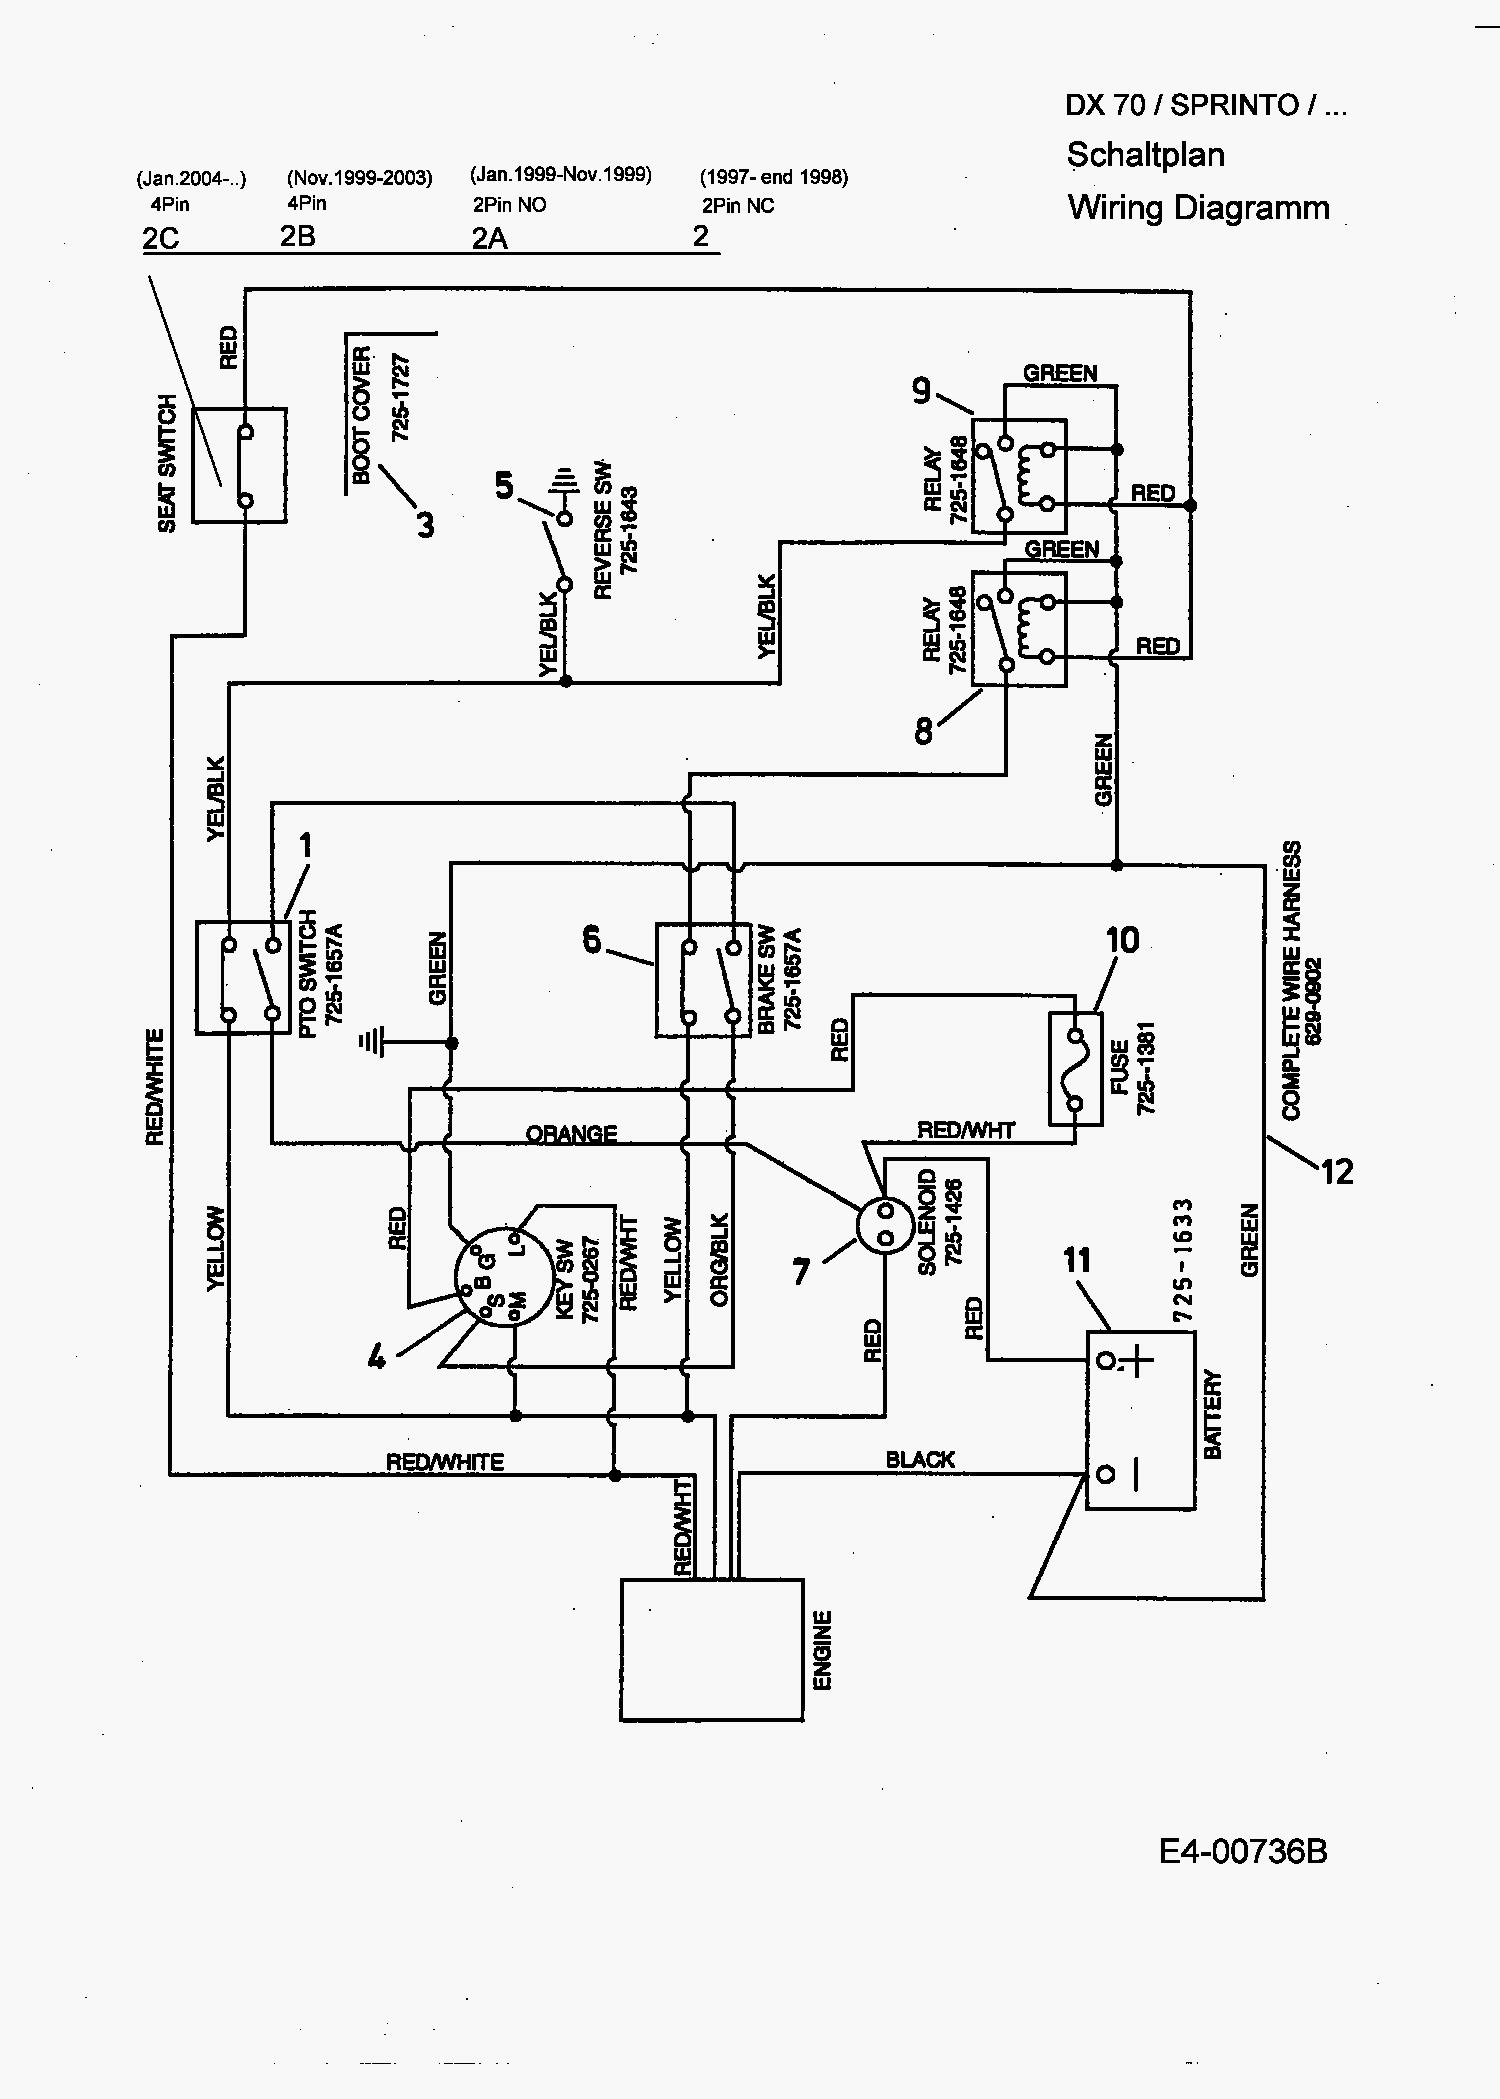 16 Hp Briggs And Stratton Wiring Diagram | Manual E-Books - Briggs And Stratton Wiring Diagram 16 Hp